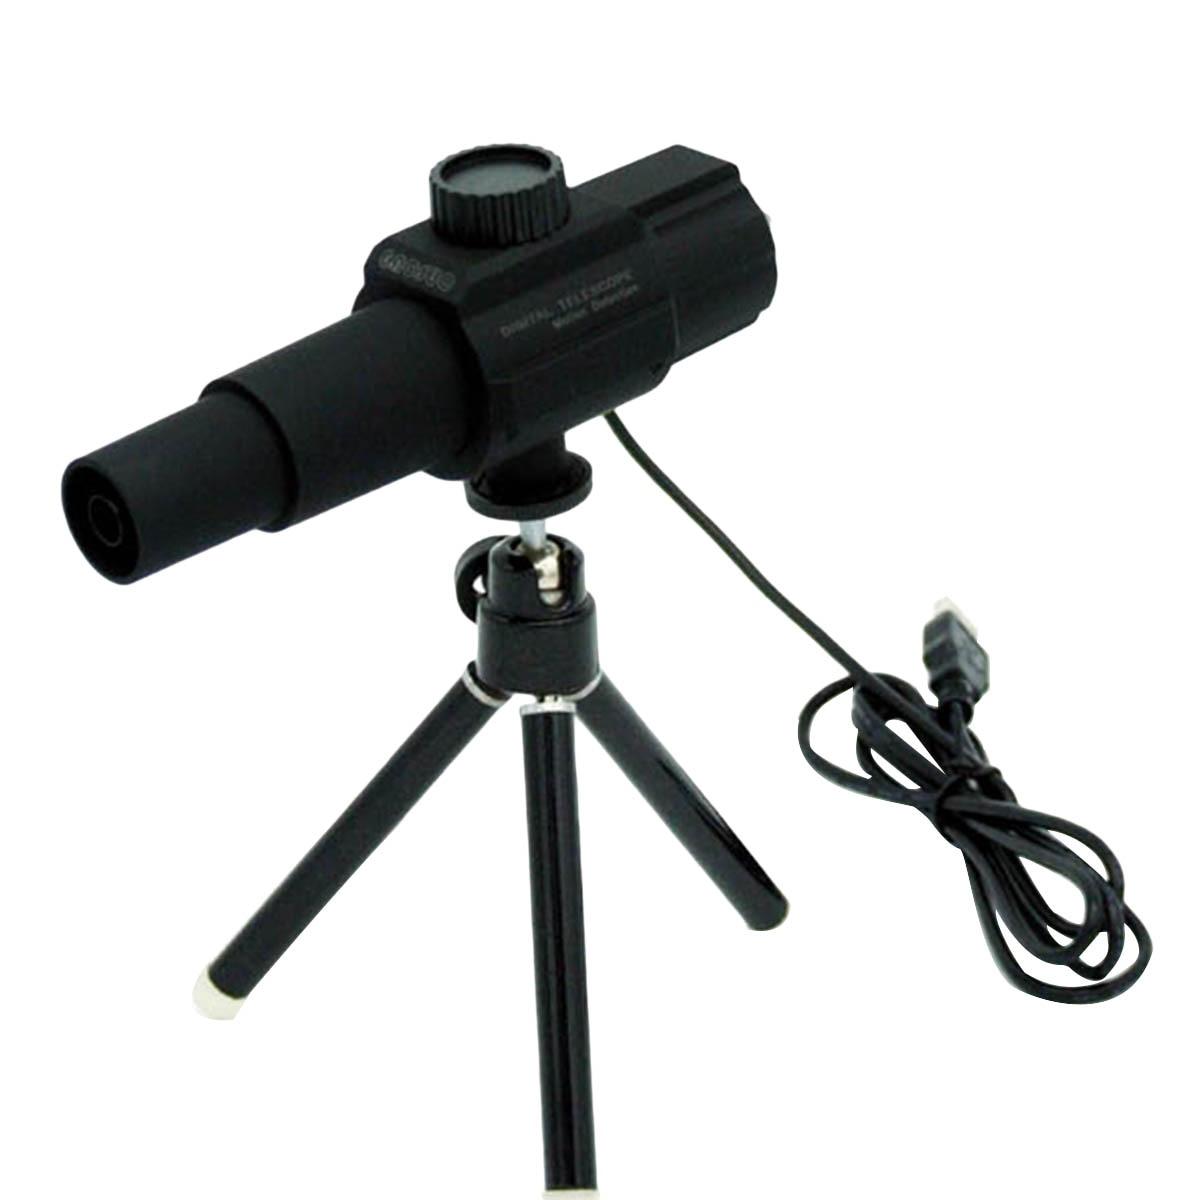 Telescopio Digital portátil de bolsillo USB 70x con trípode para detectar conciertos (negro)